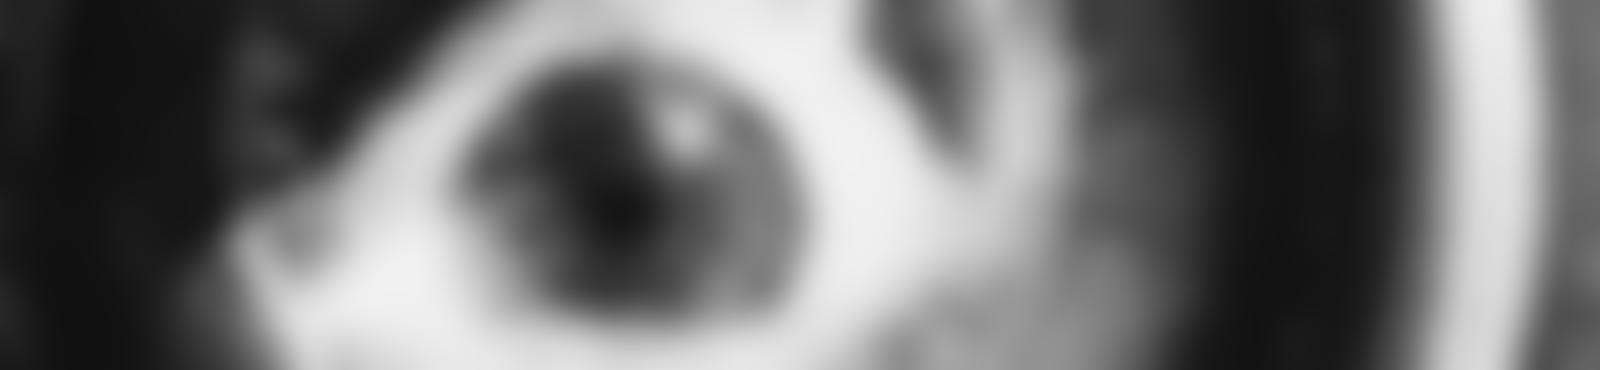 Blurred 0c57633d 8f7c 4ef5 acf7 971b36fb8ea1